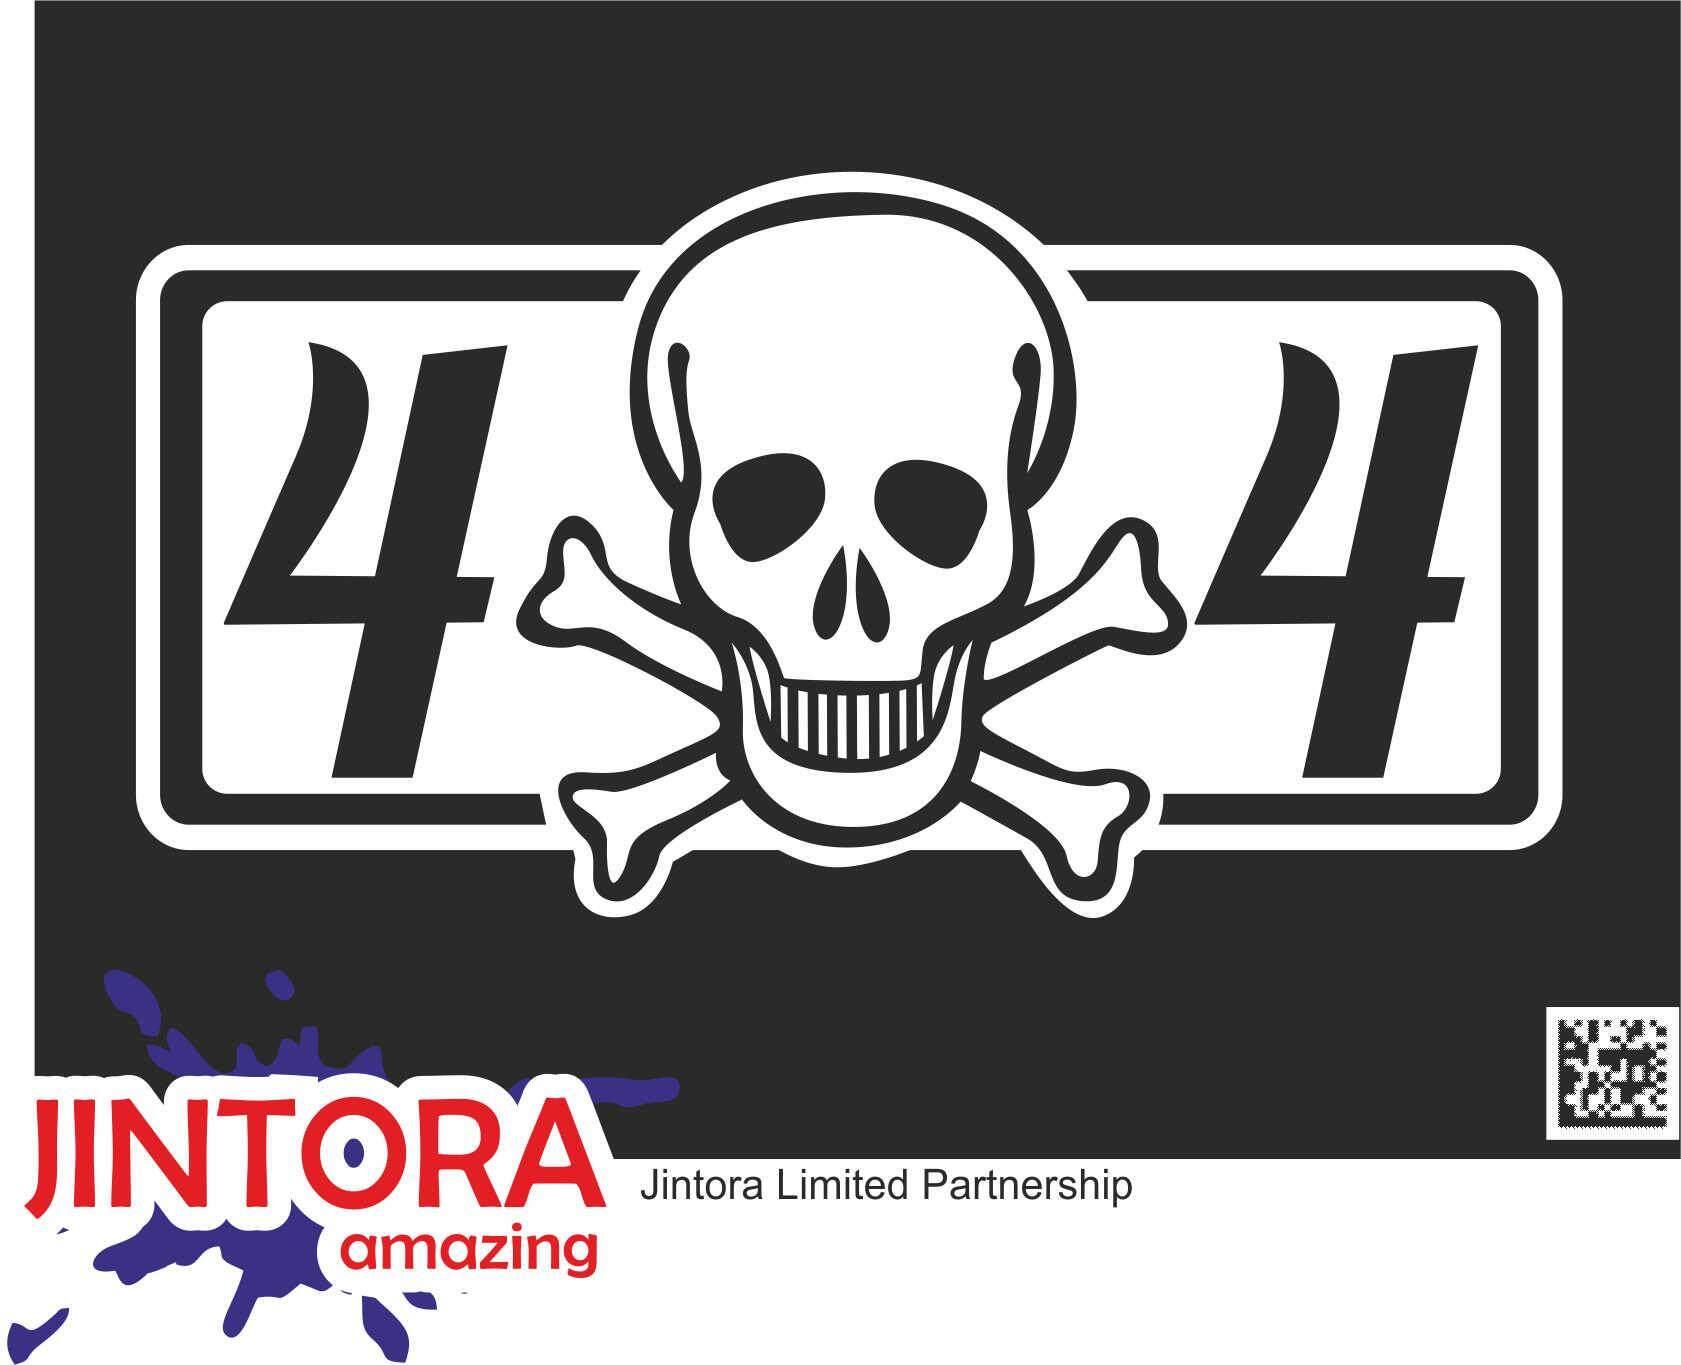 4x GLOW PLUG FOR FIAT BRAVO 2 II CROMA MULTIPLA PUNTO STILO 11 VOLT